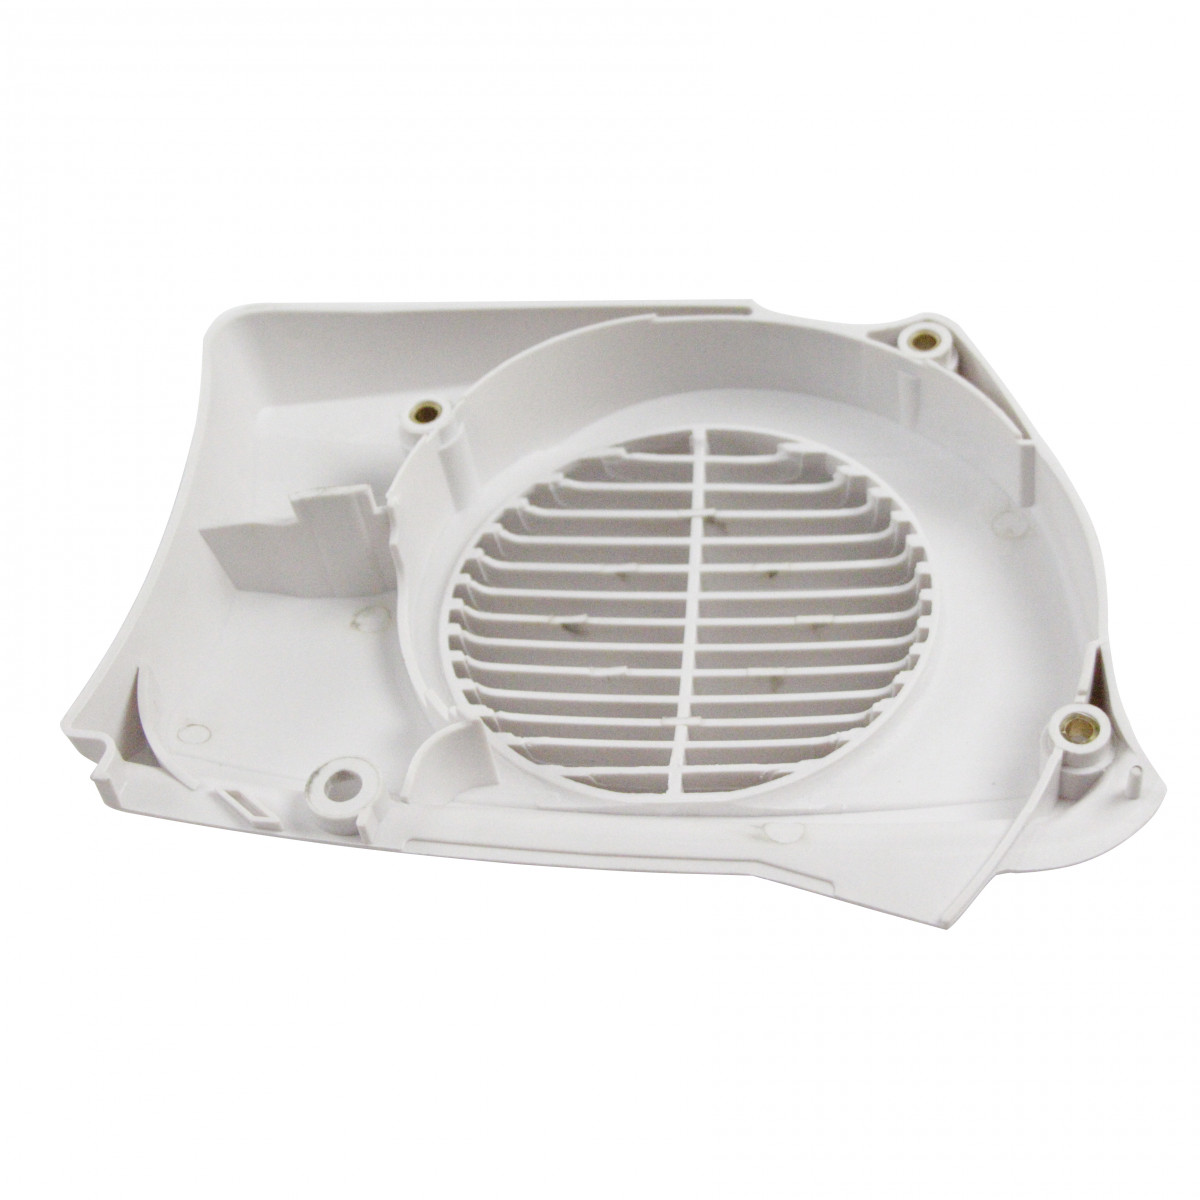 Kryt ventilátoru STIHL TS410 TS420 - 4238 080 3100